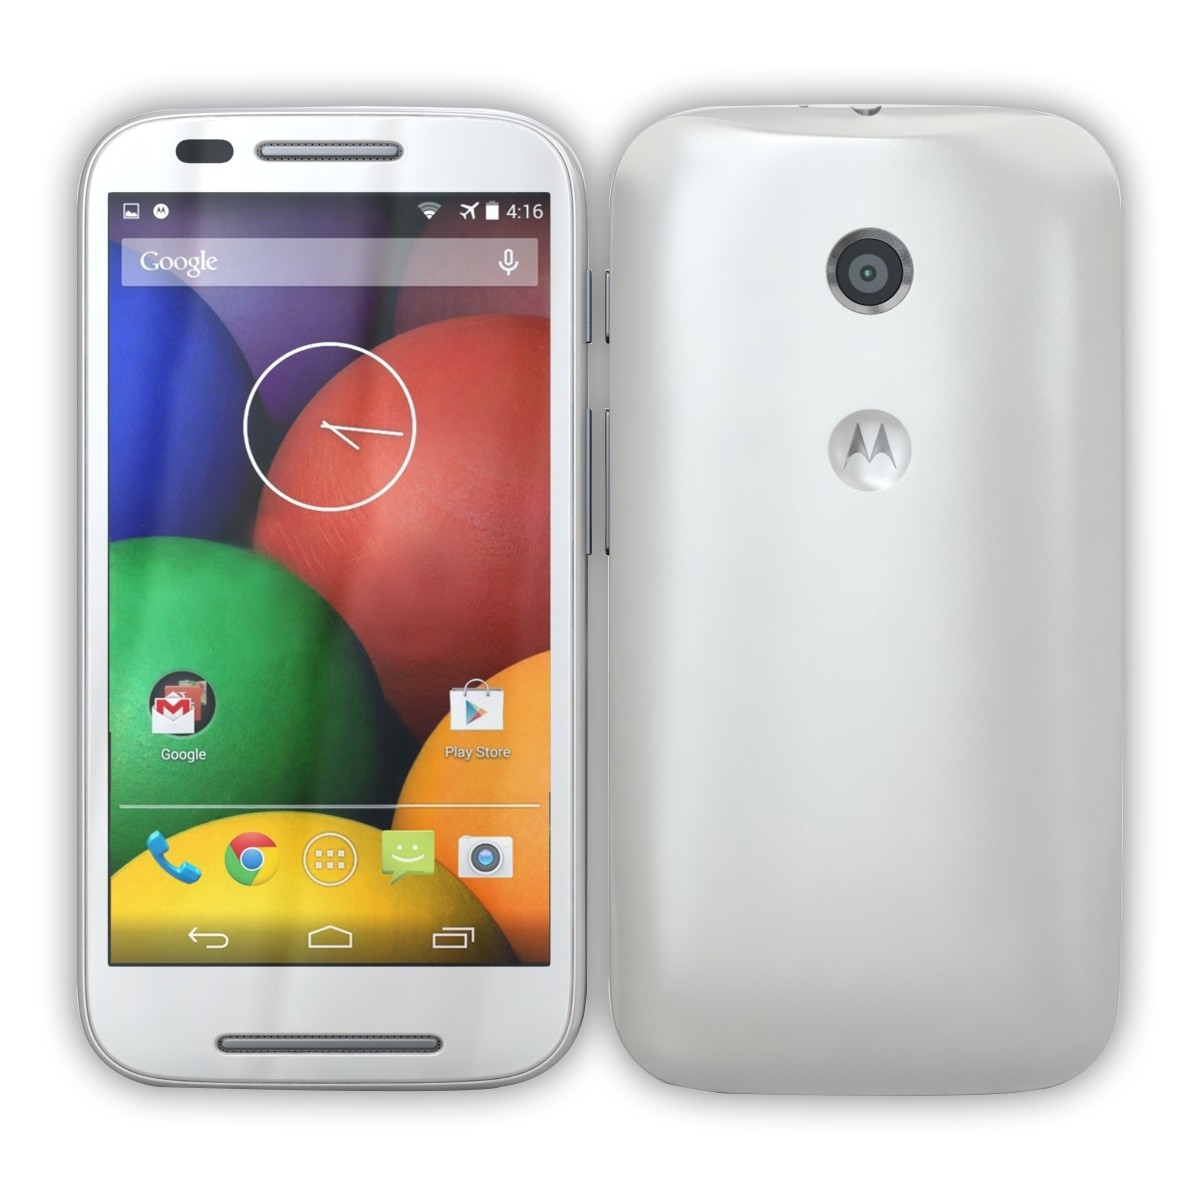 Smartphone Moto E Dtv Colors Dual XT1025 4GB Wi-fi 3G Android (Usado)